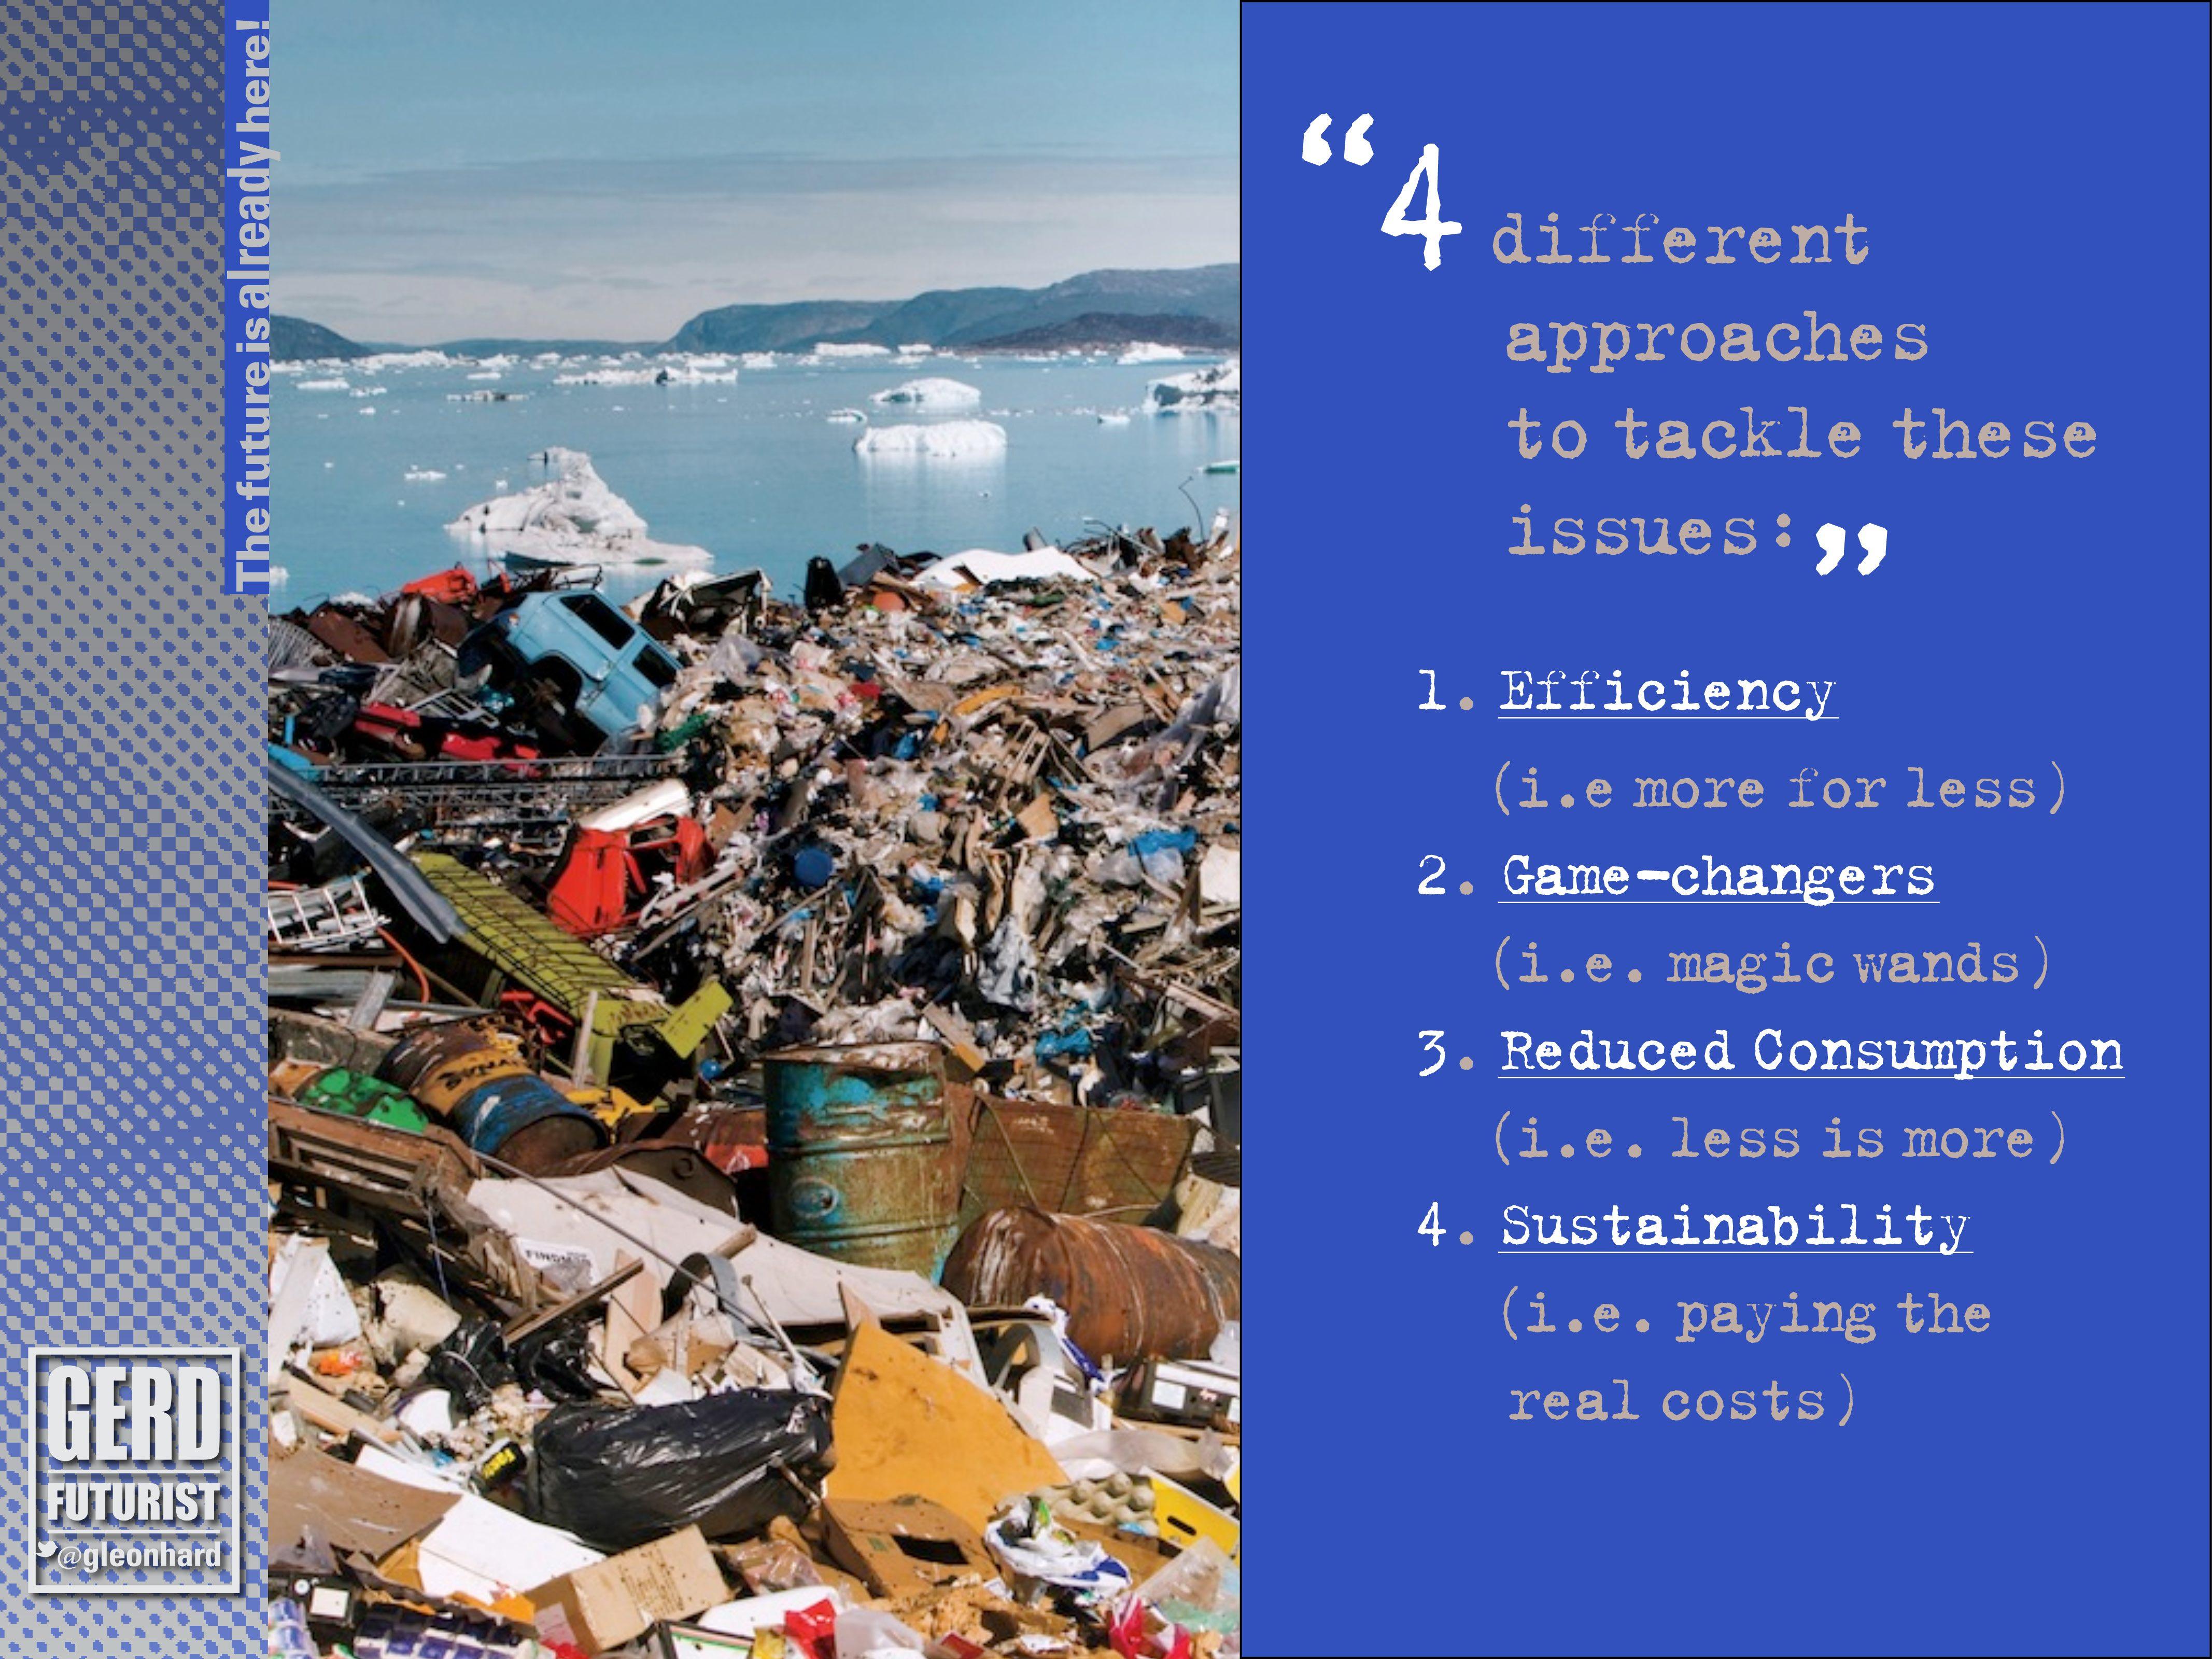 Gerd Leonhard Futurist Ego Eco Approaches